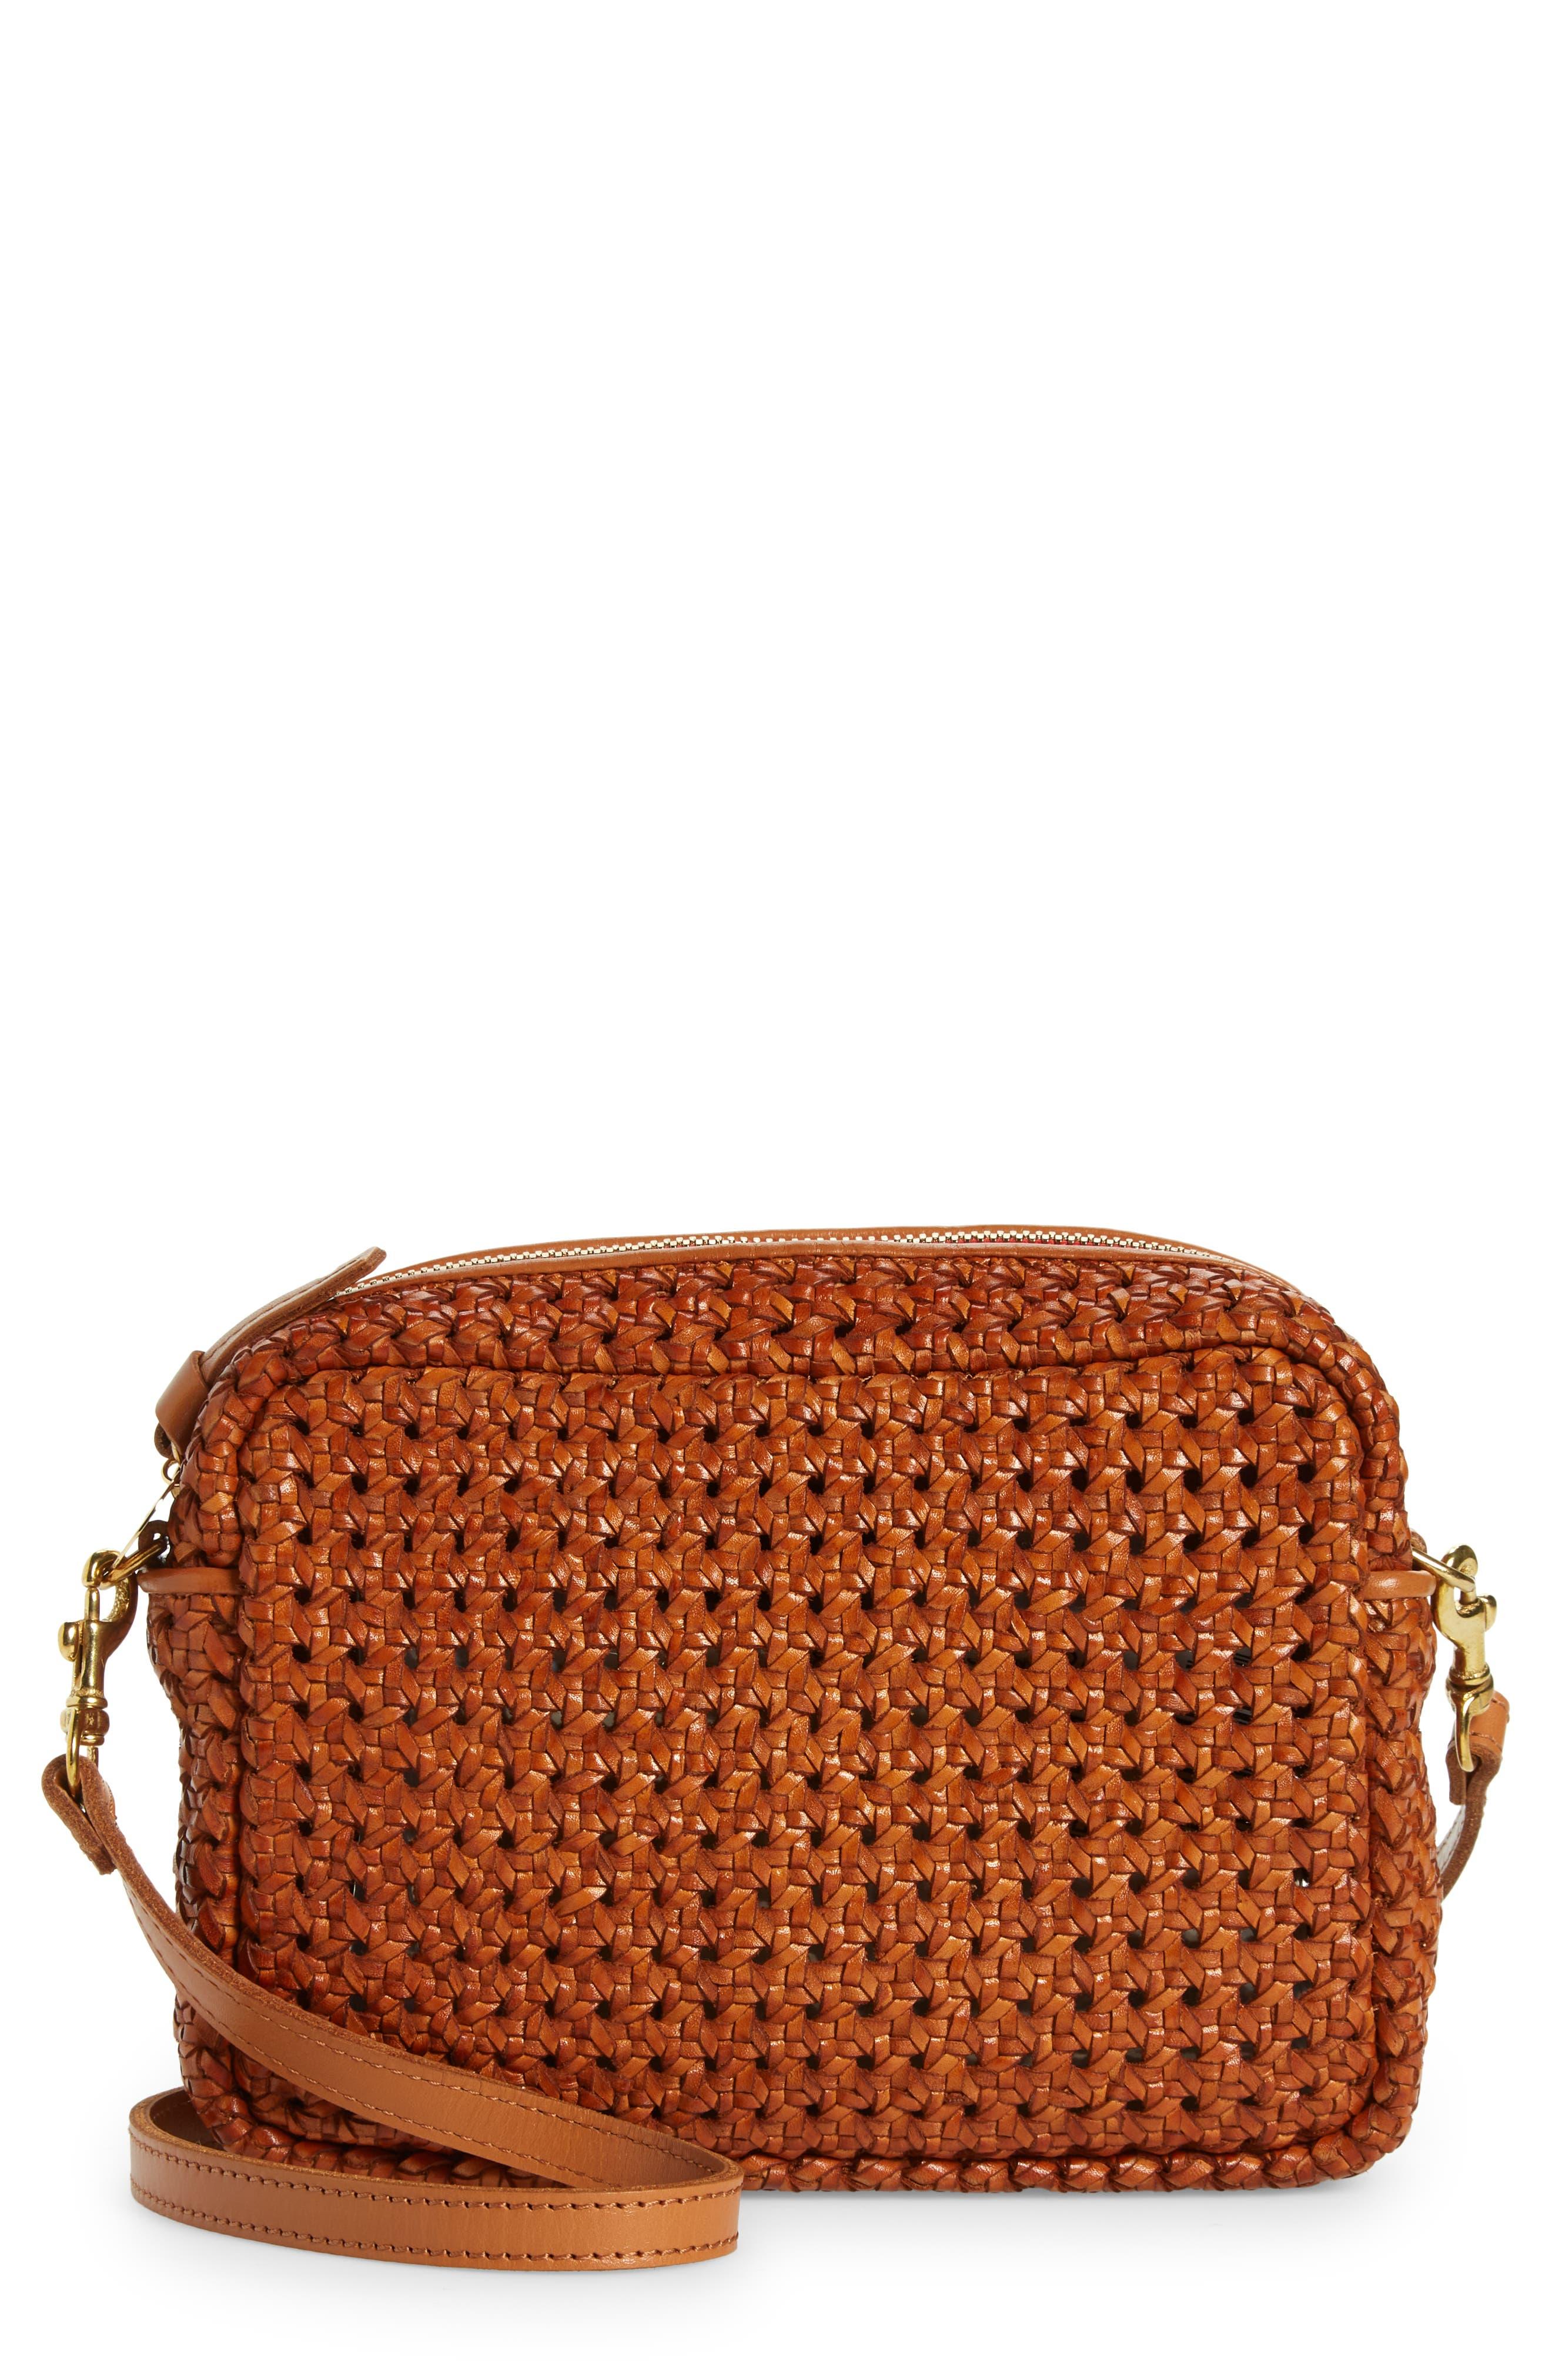 Midi Sac Woven Leather Crossbody Bag